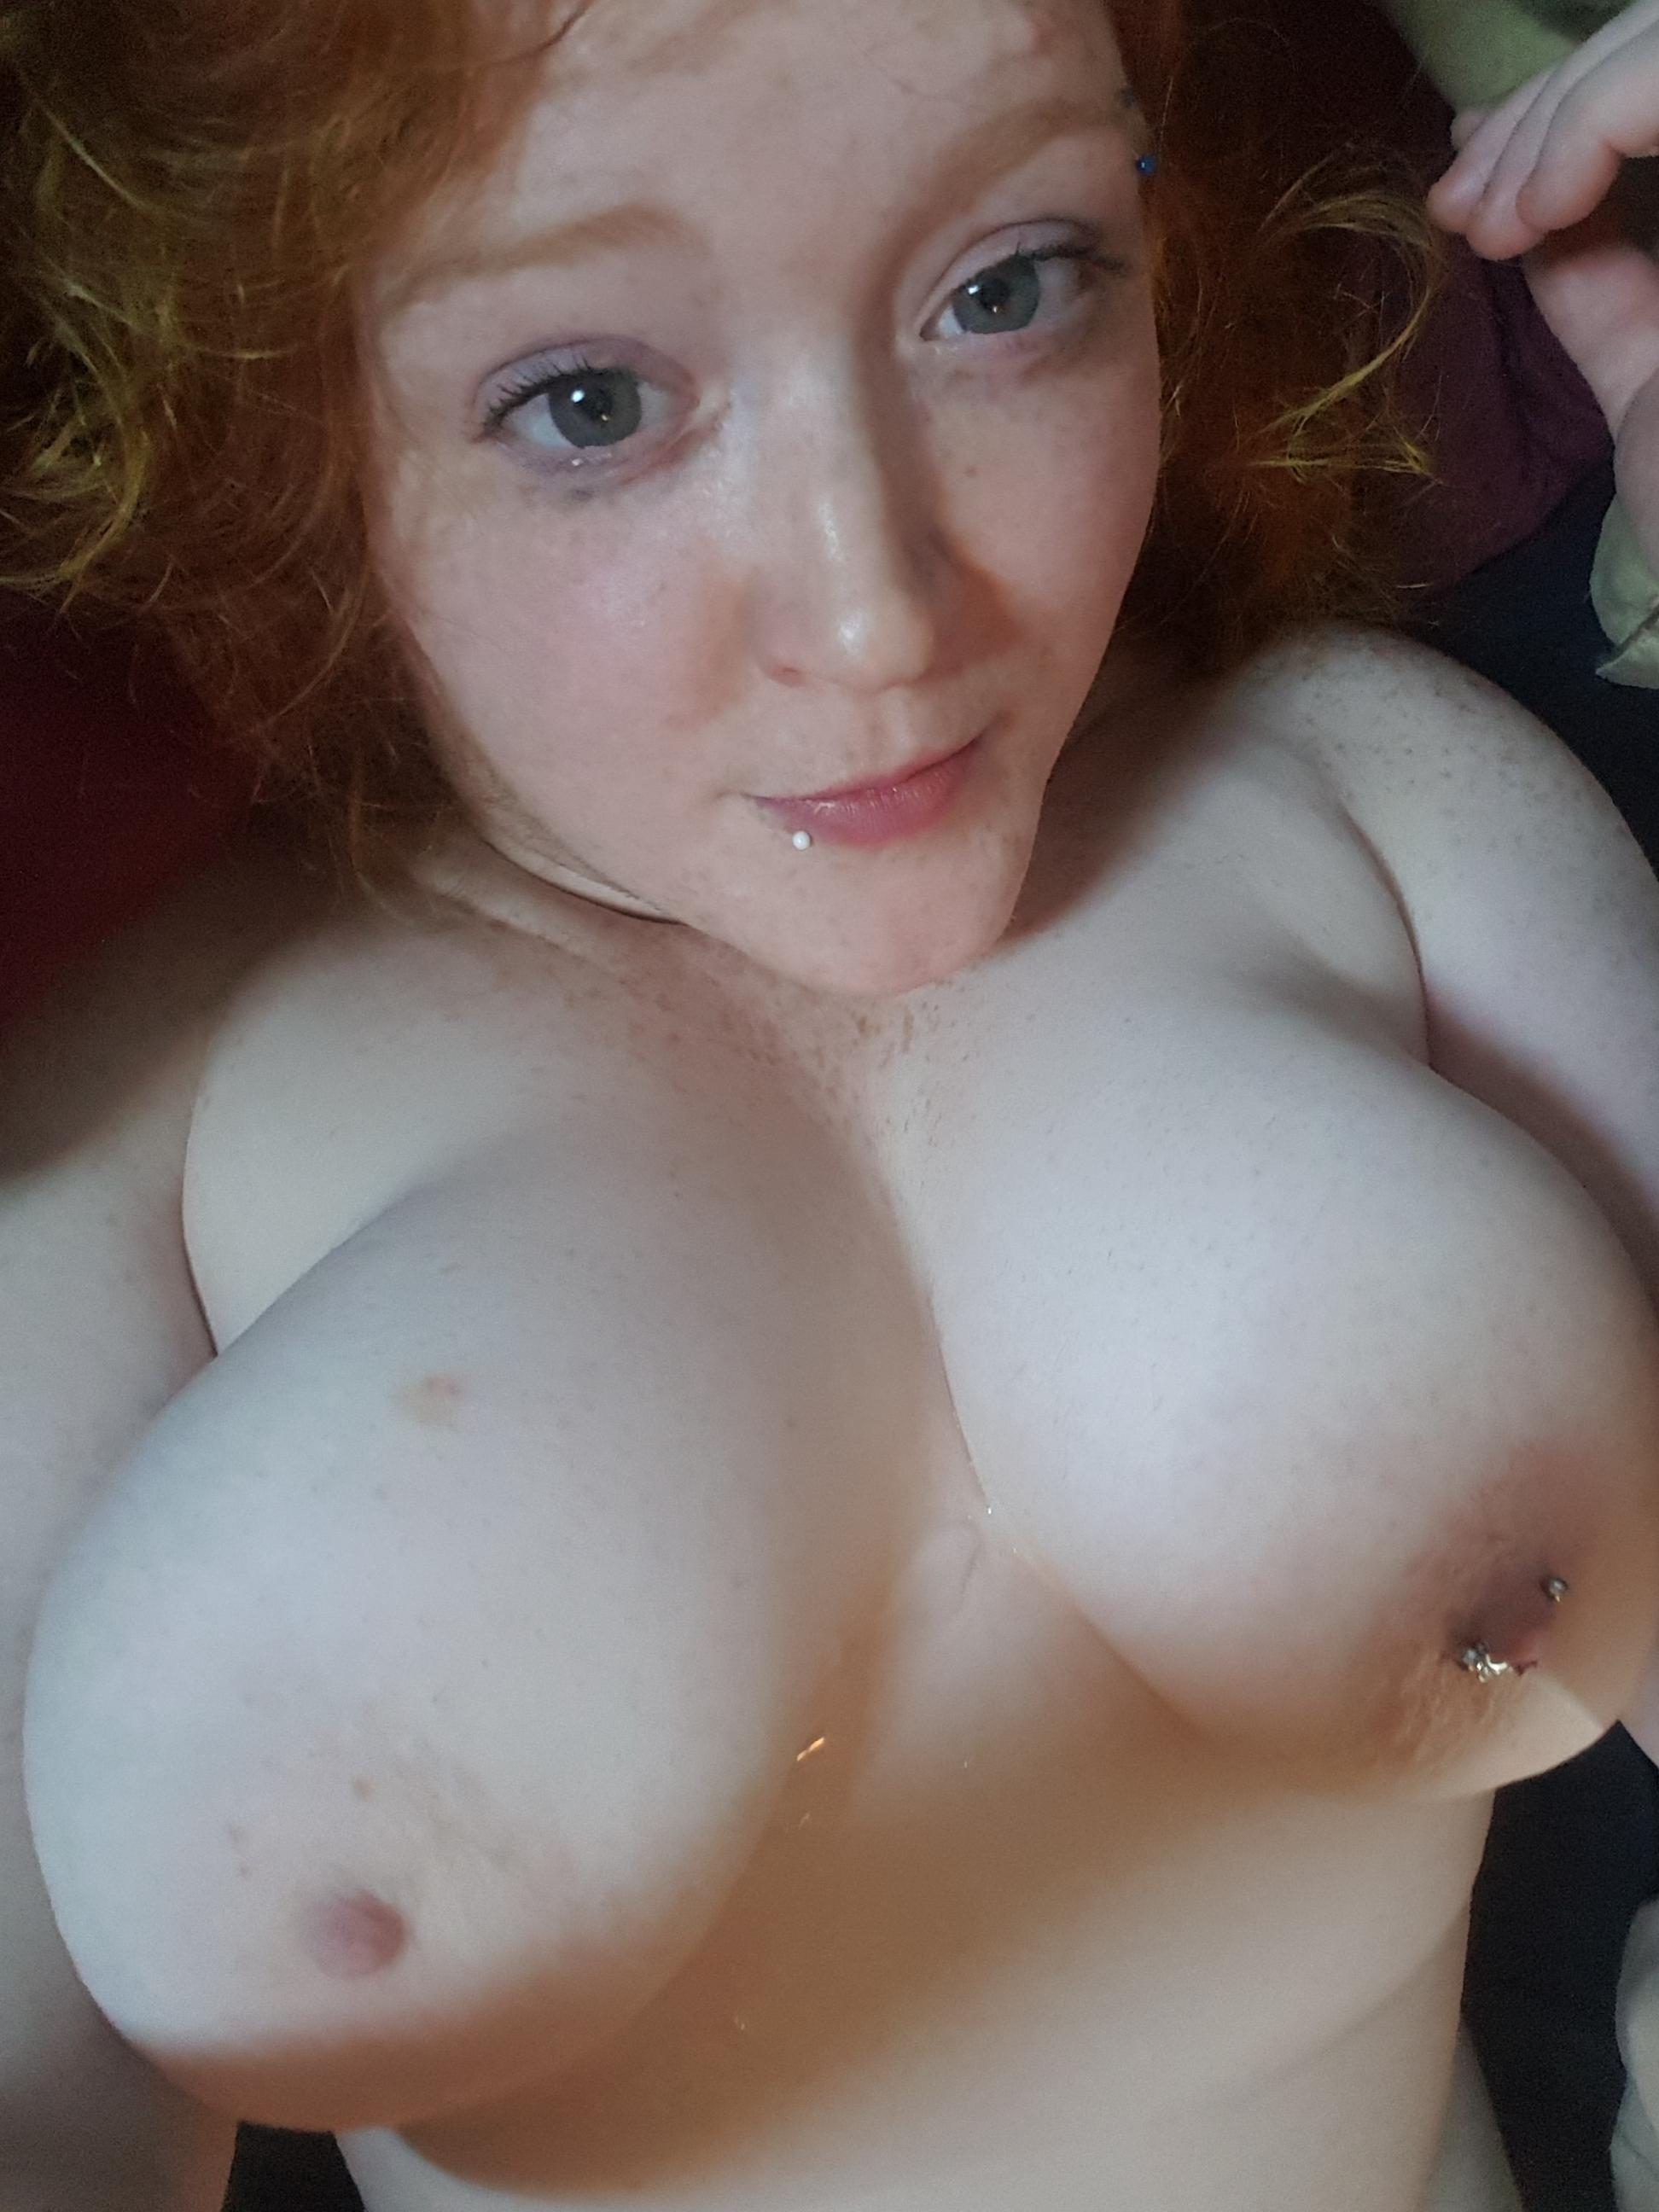 Hot amateur girl nude